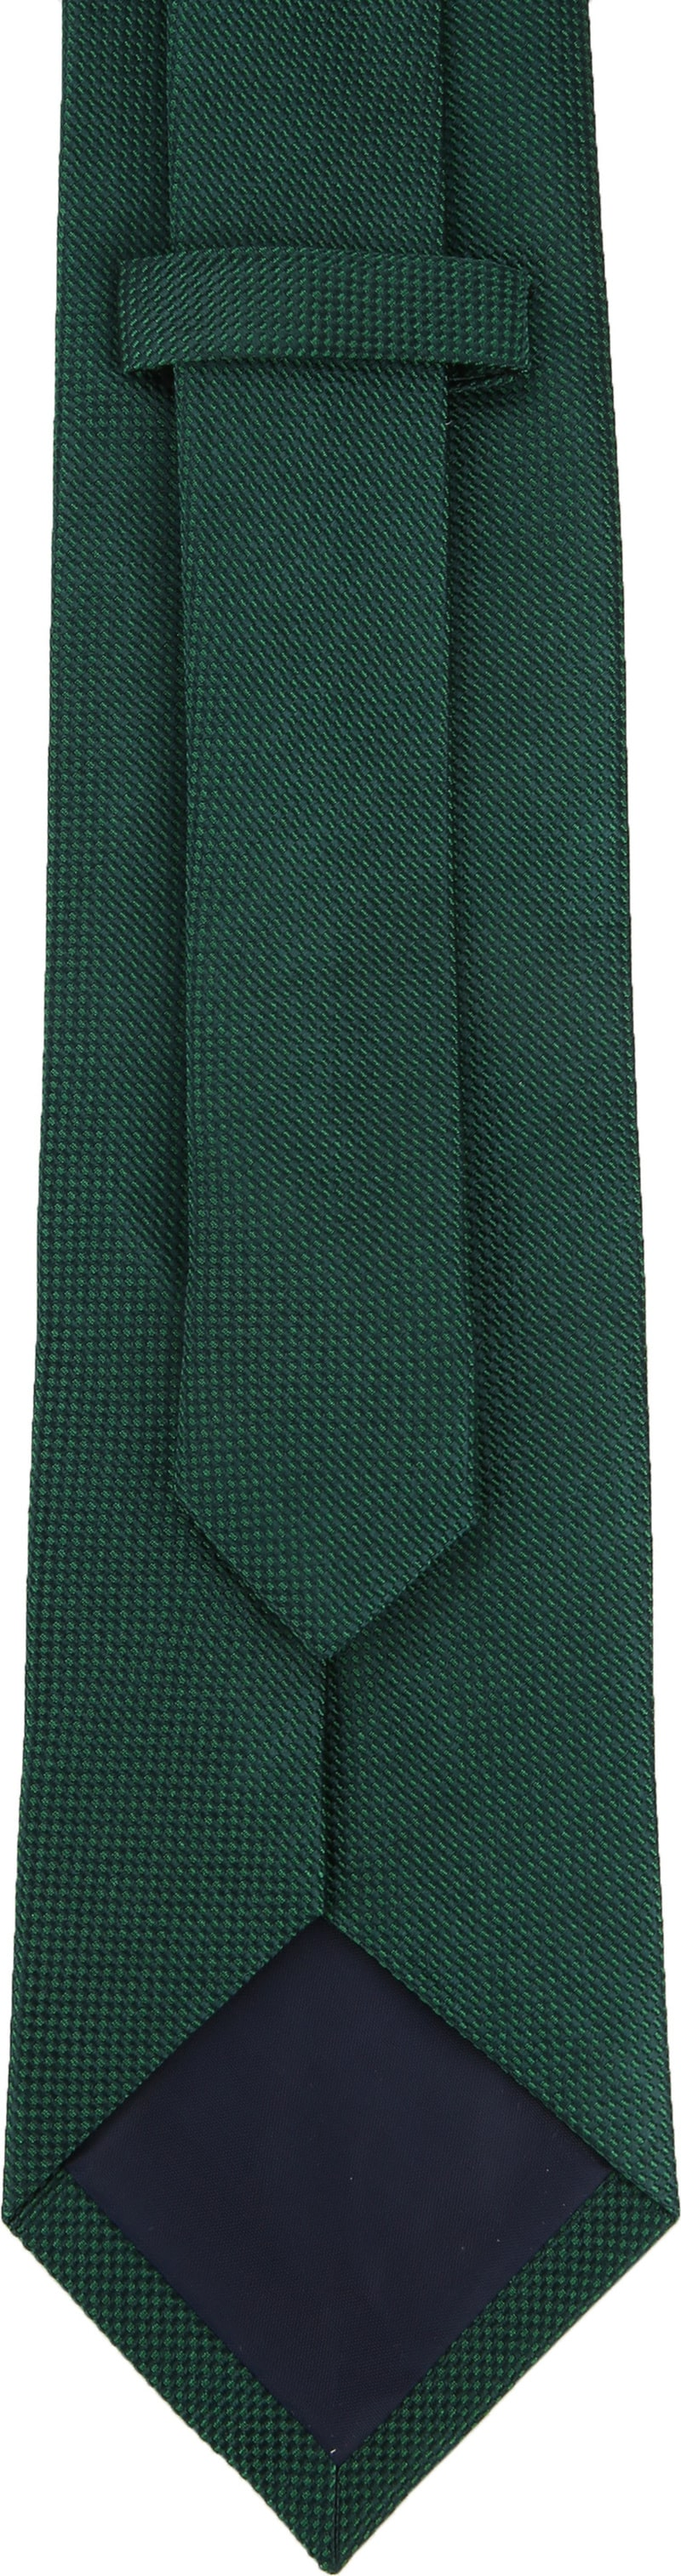 Suitable Tie Silk Green 19 photo 2